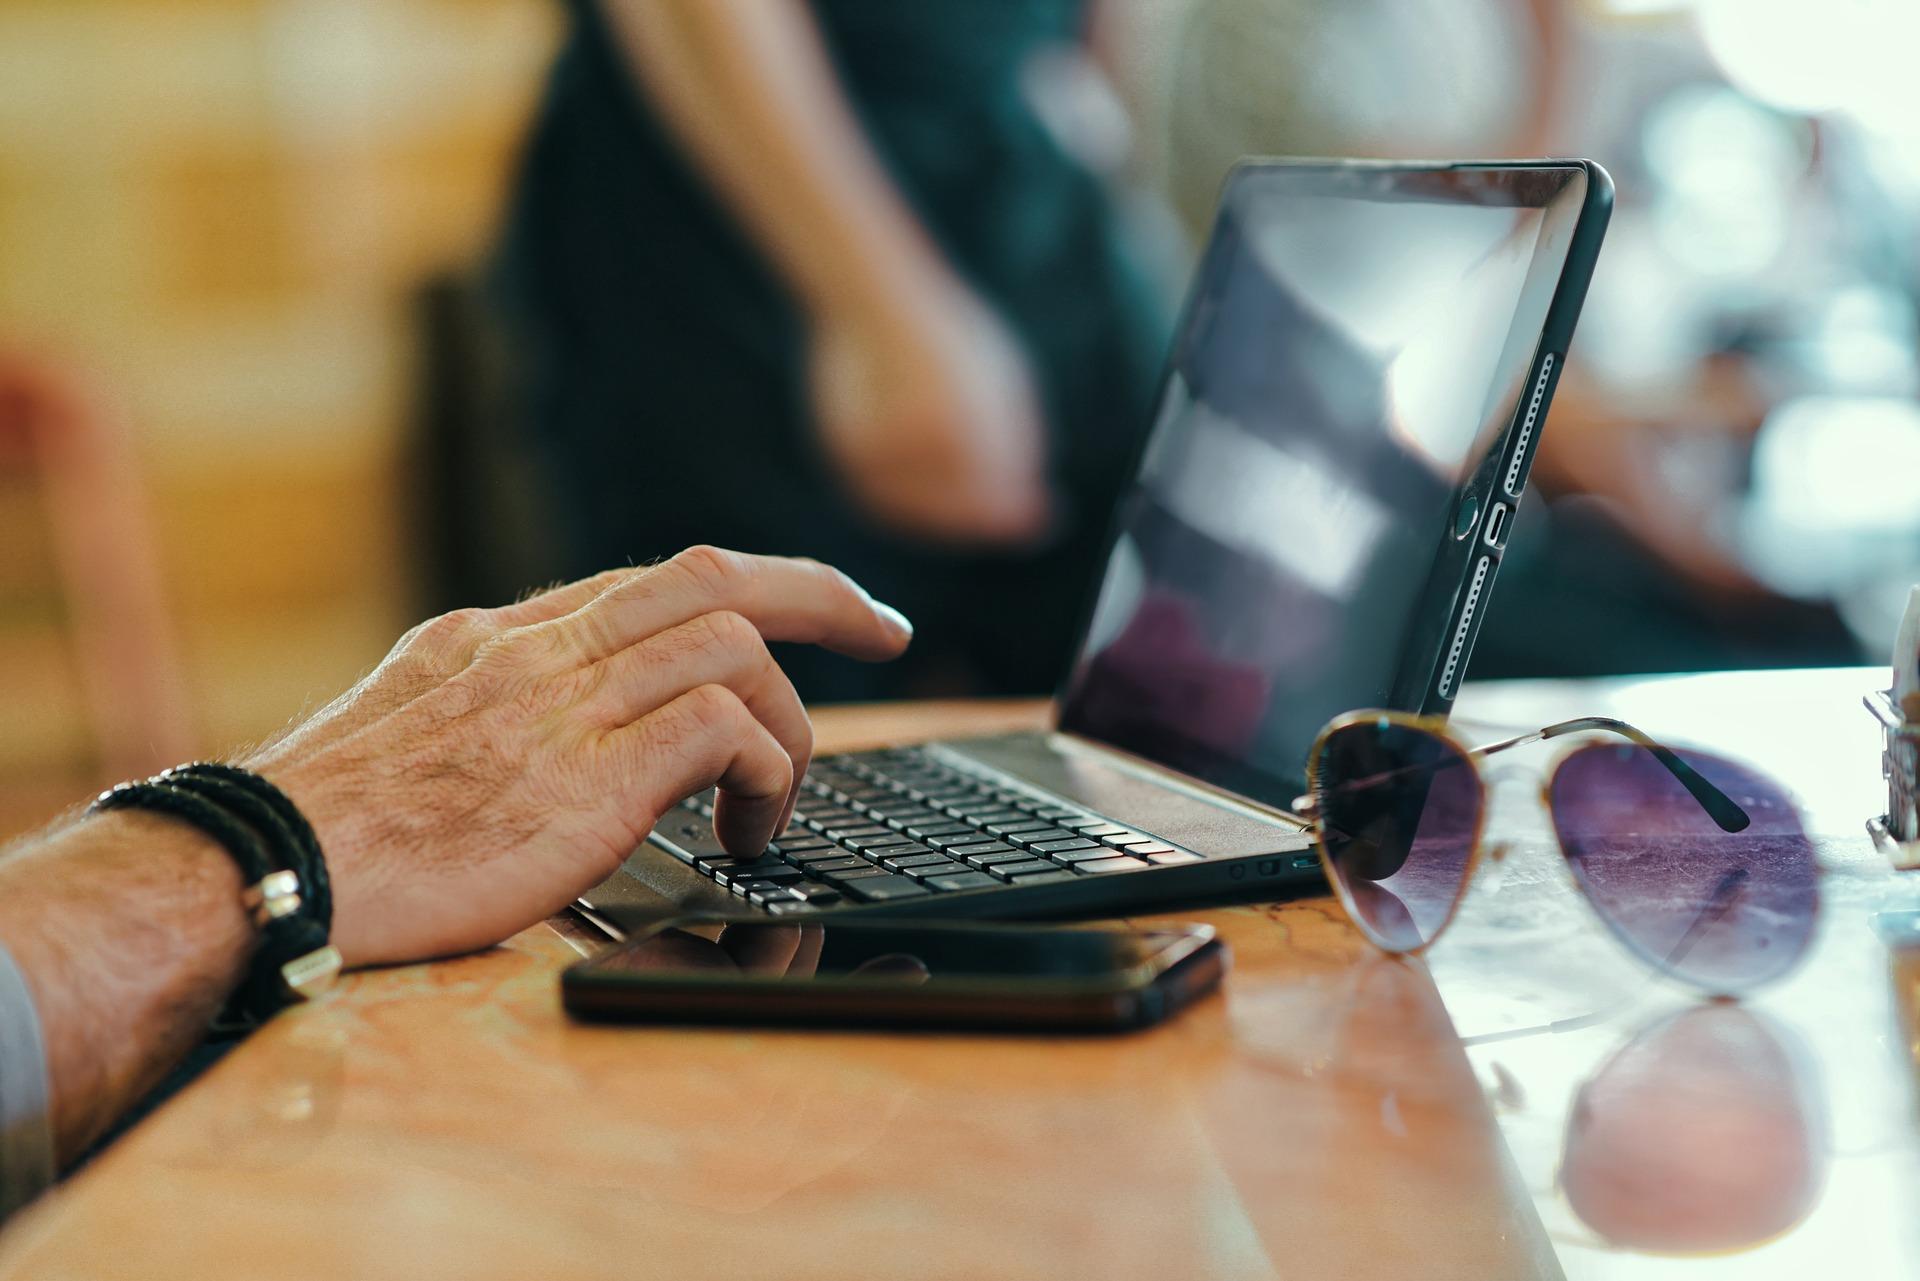 Treatment for Internet Addiction